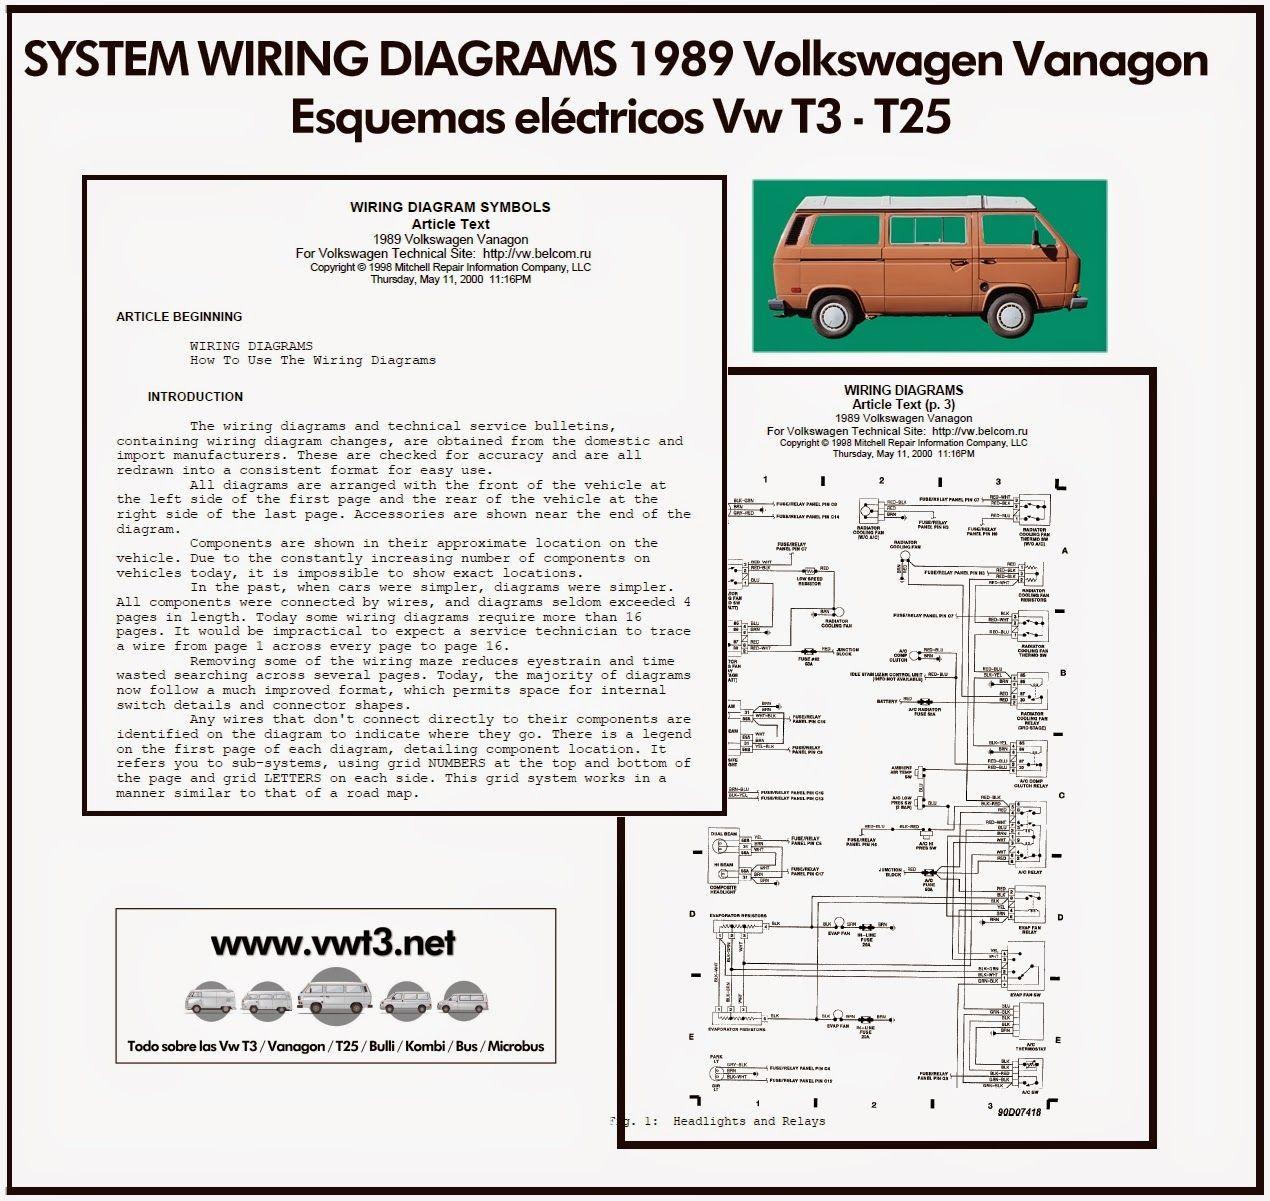 vw transporter wiring diagrams oil burner diagram vwt3 t3 t25 system 1989